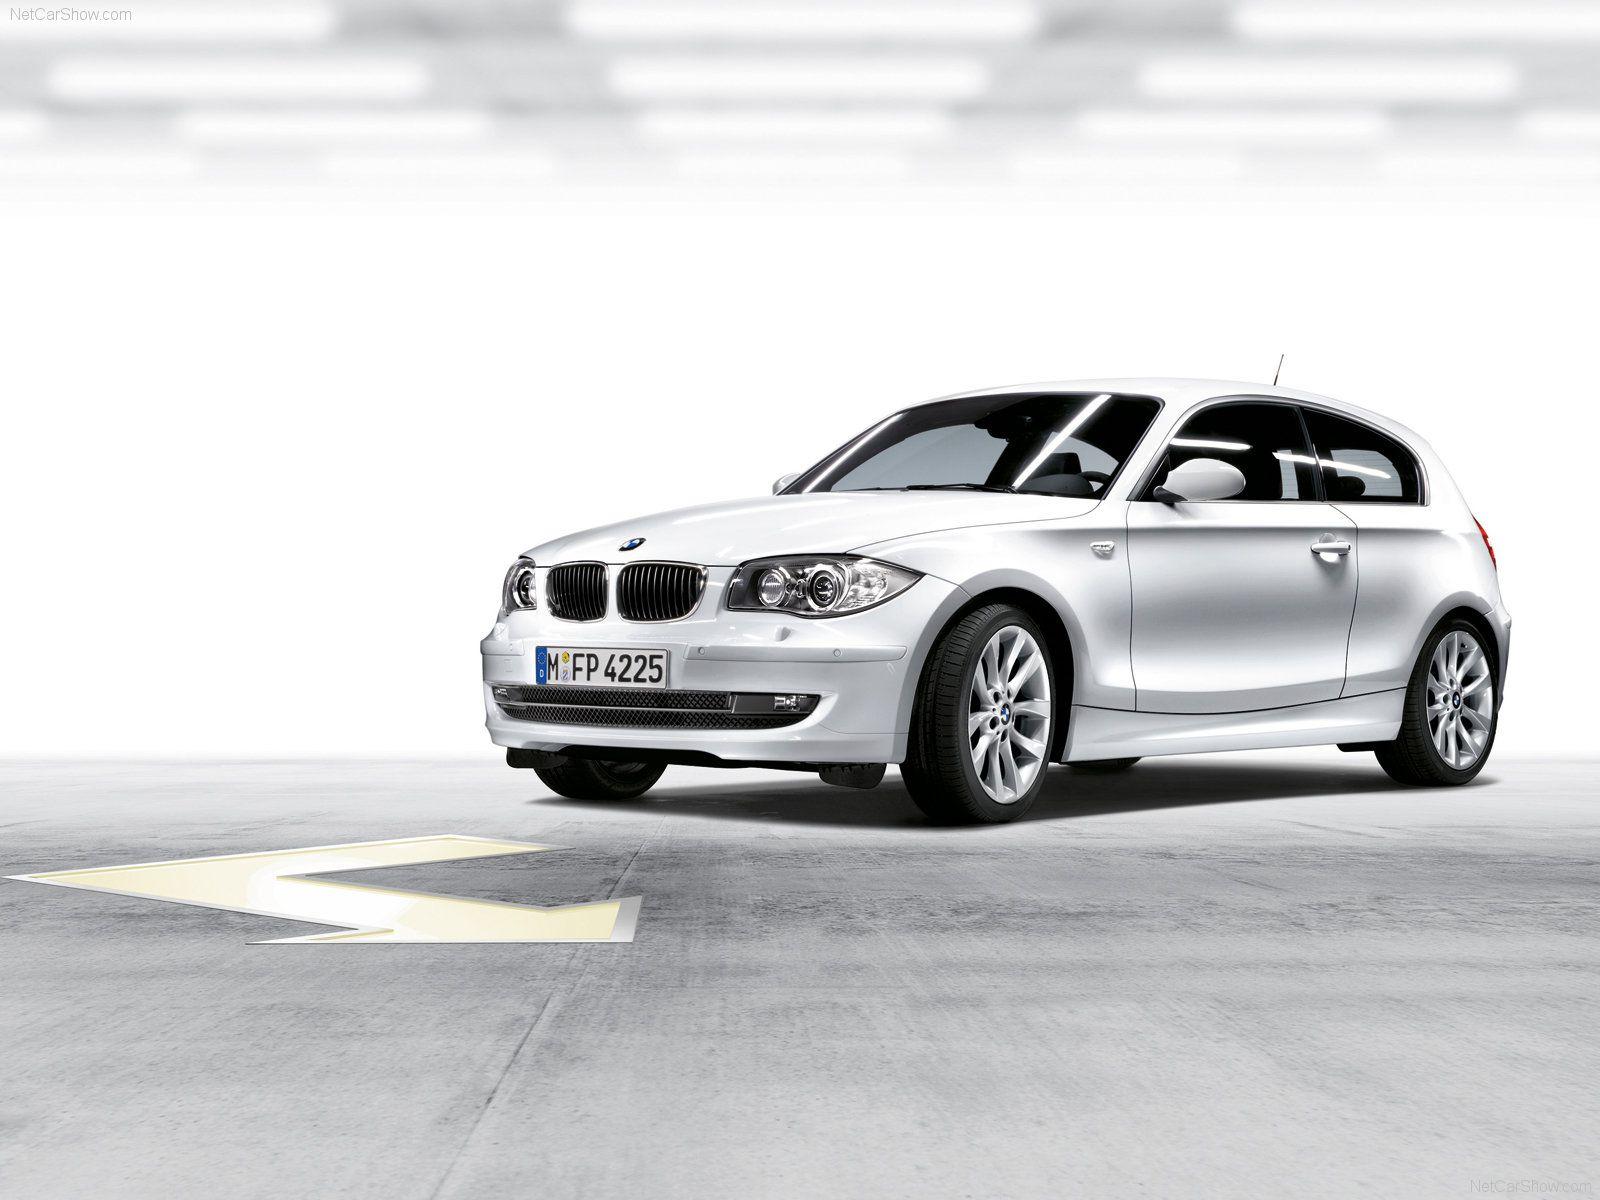 белая BMW E81 1-й серии, фото, обои